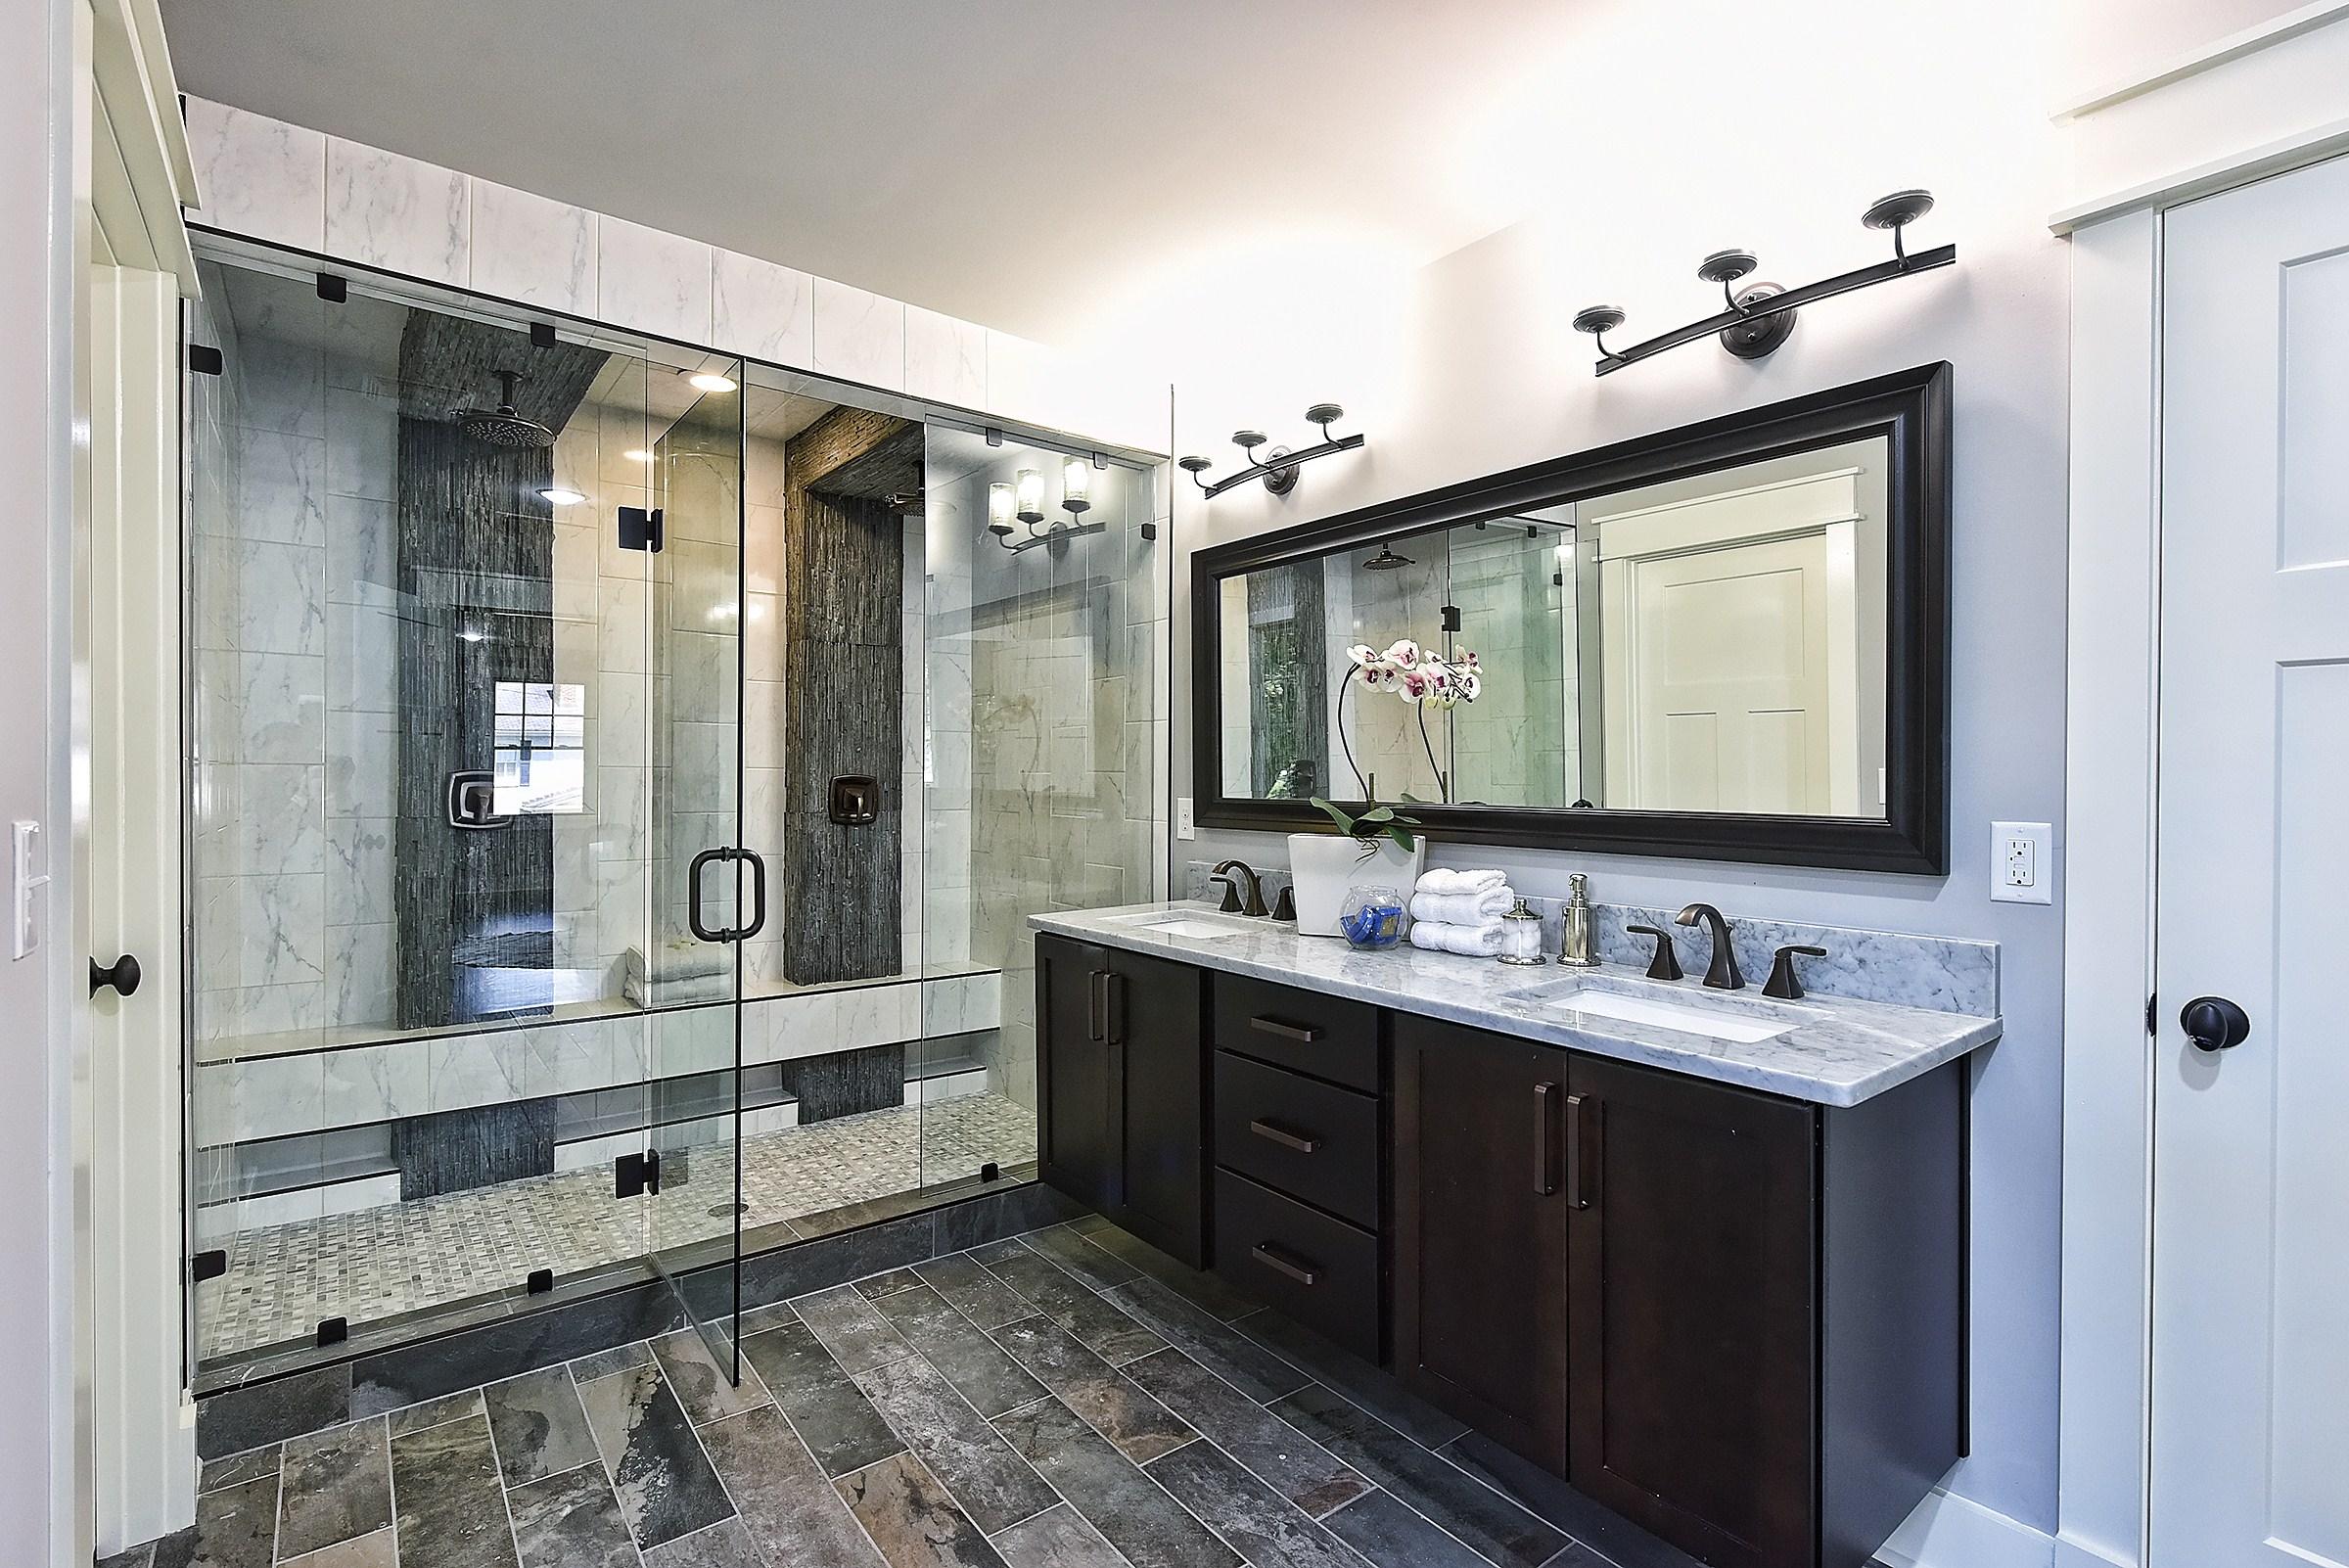 034_Master Bathroom.jpg